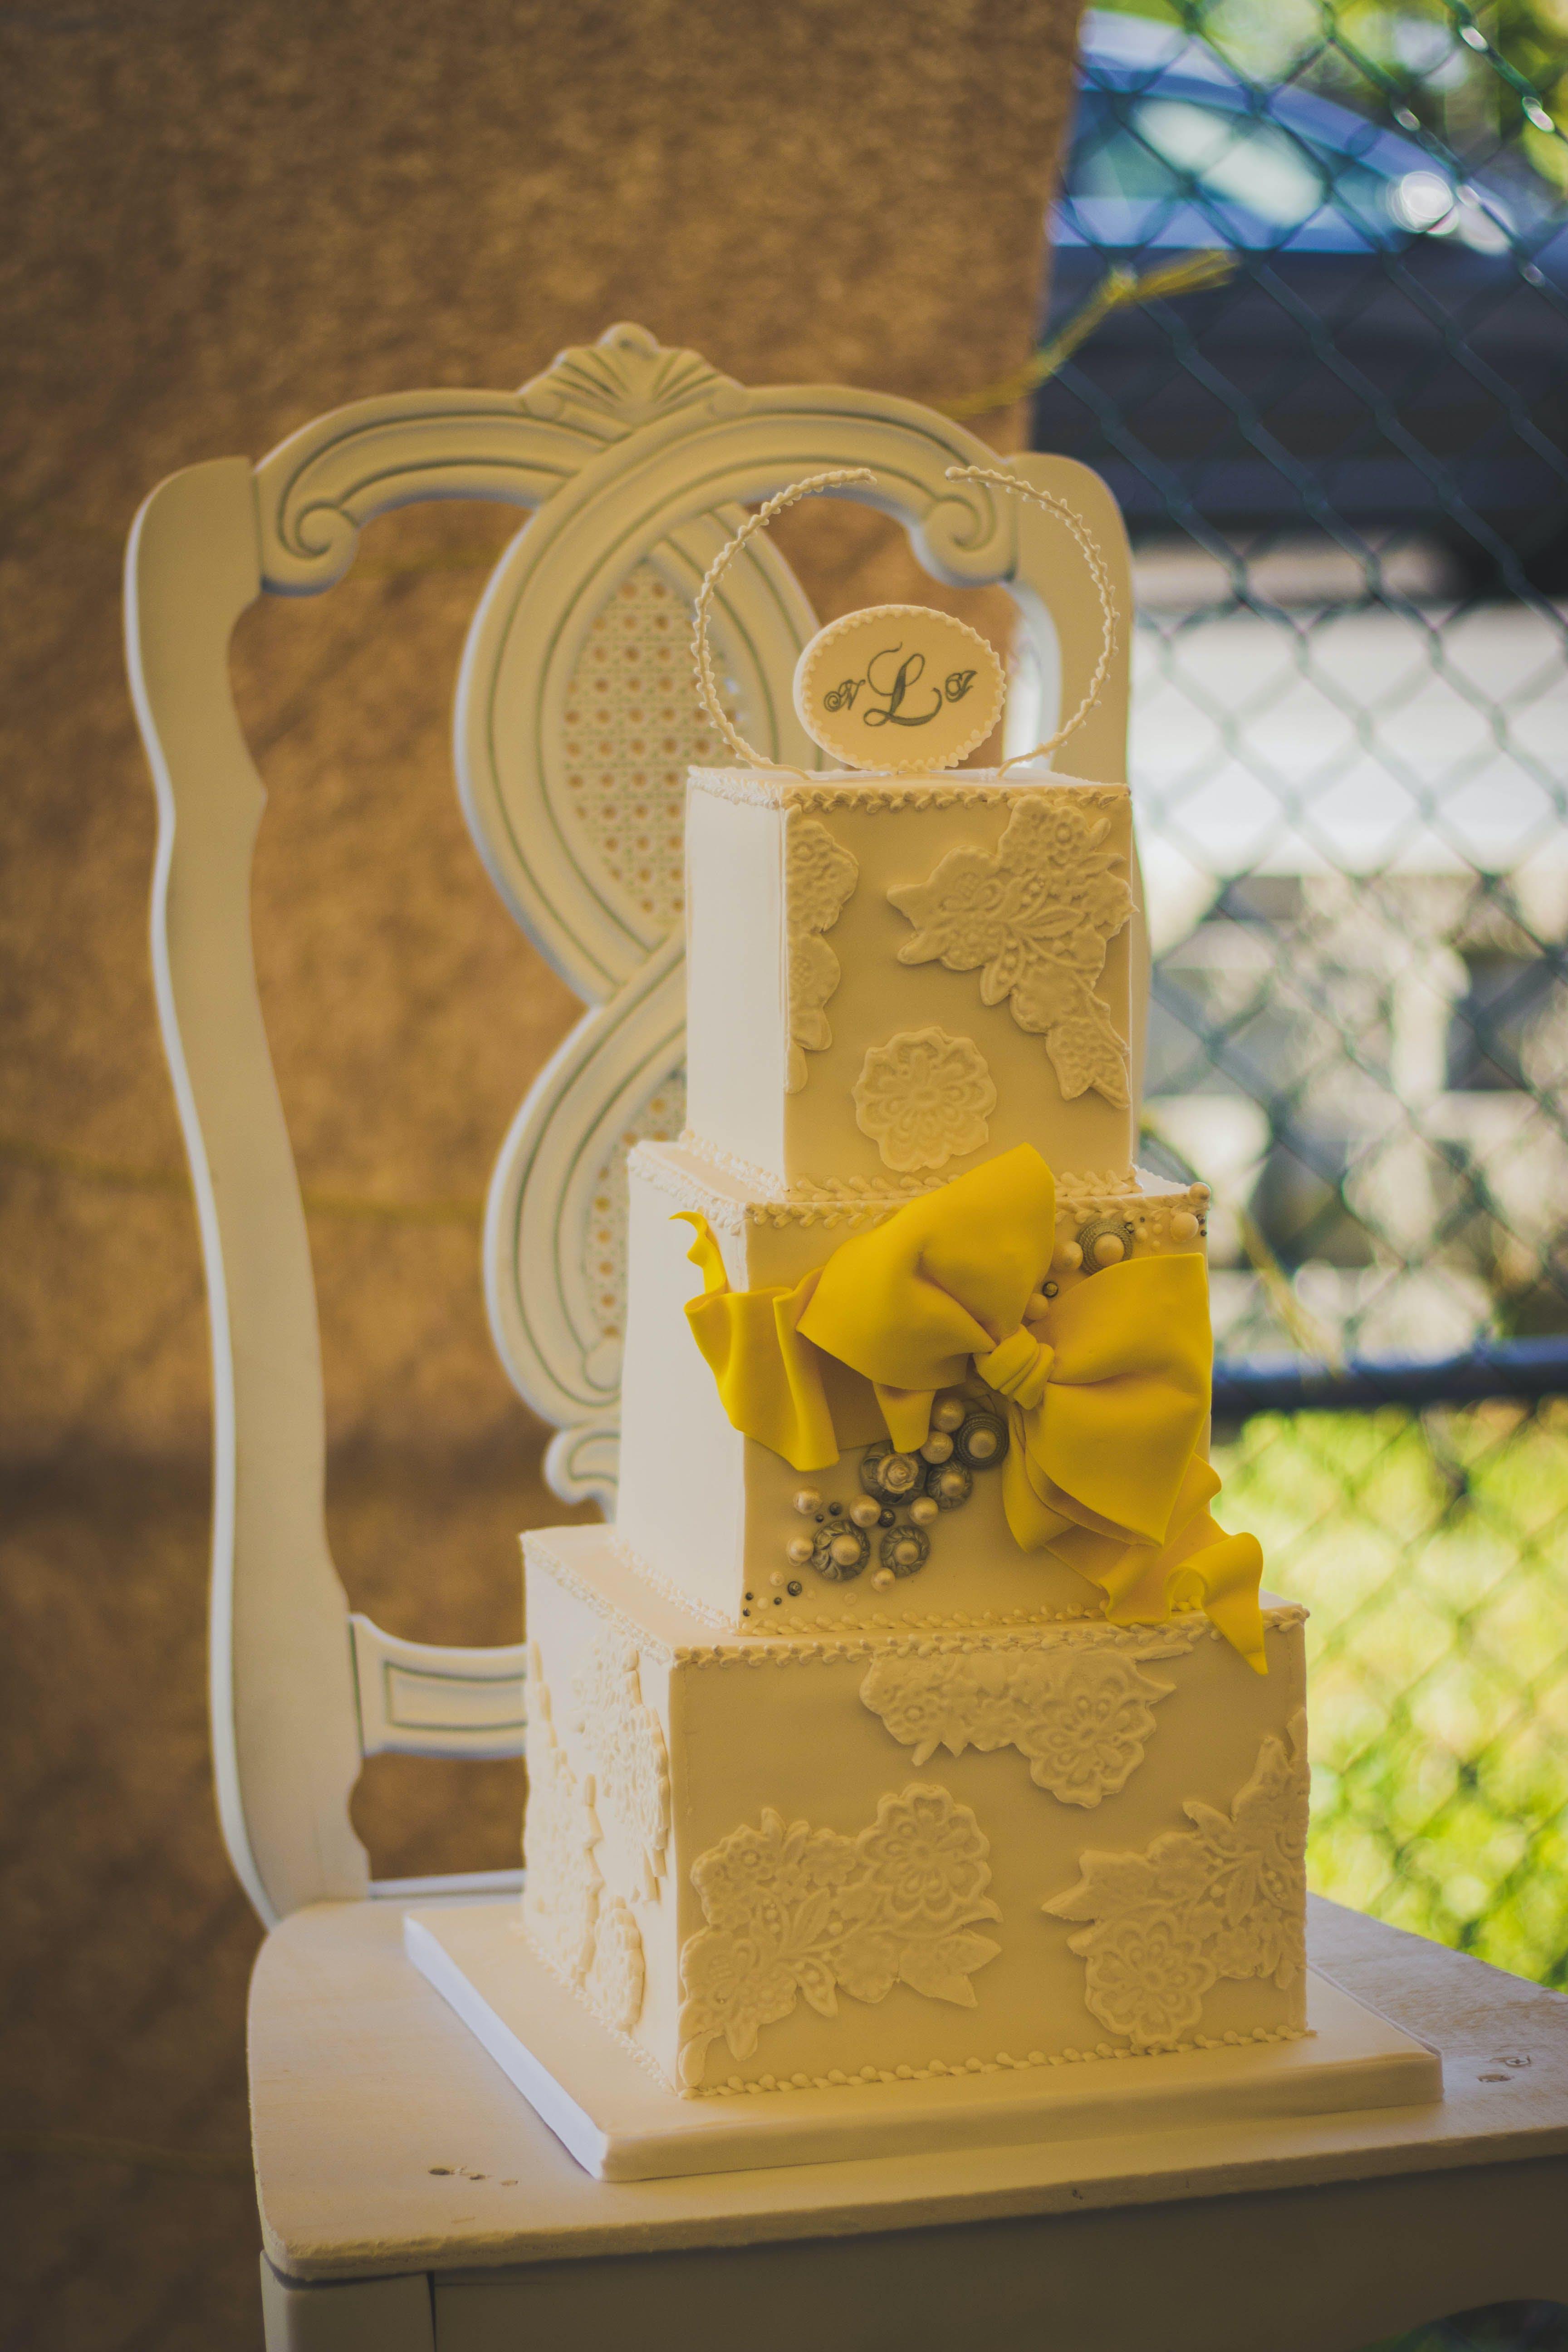 Free stock photo of anniversary, beautiful, Bride and Groom, cake